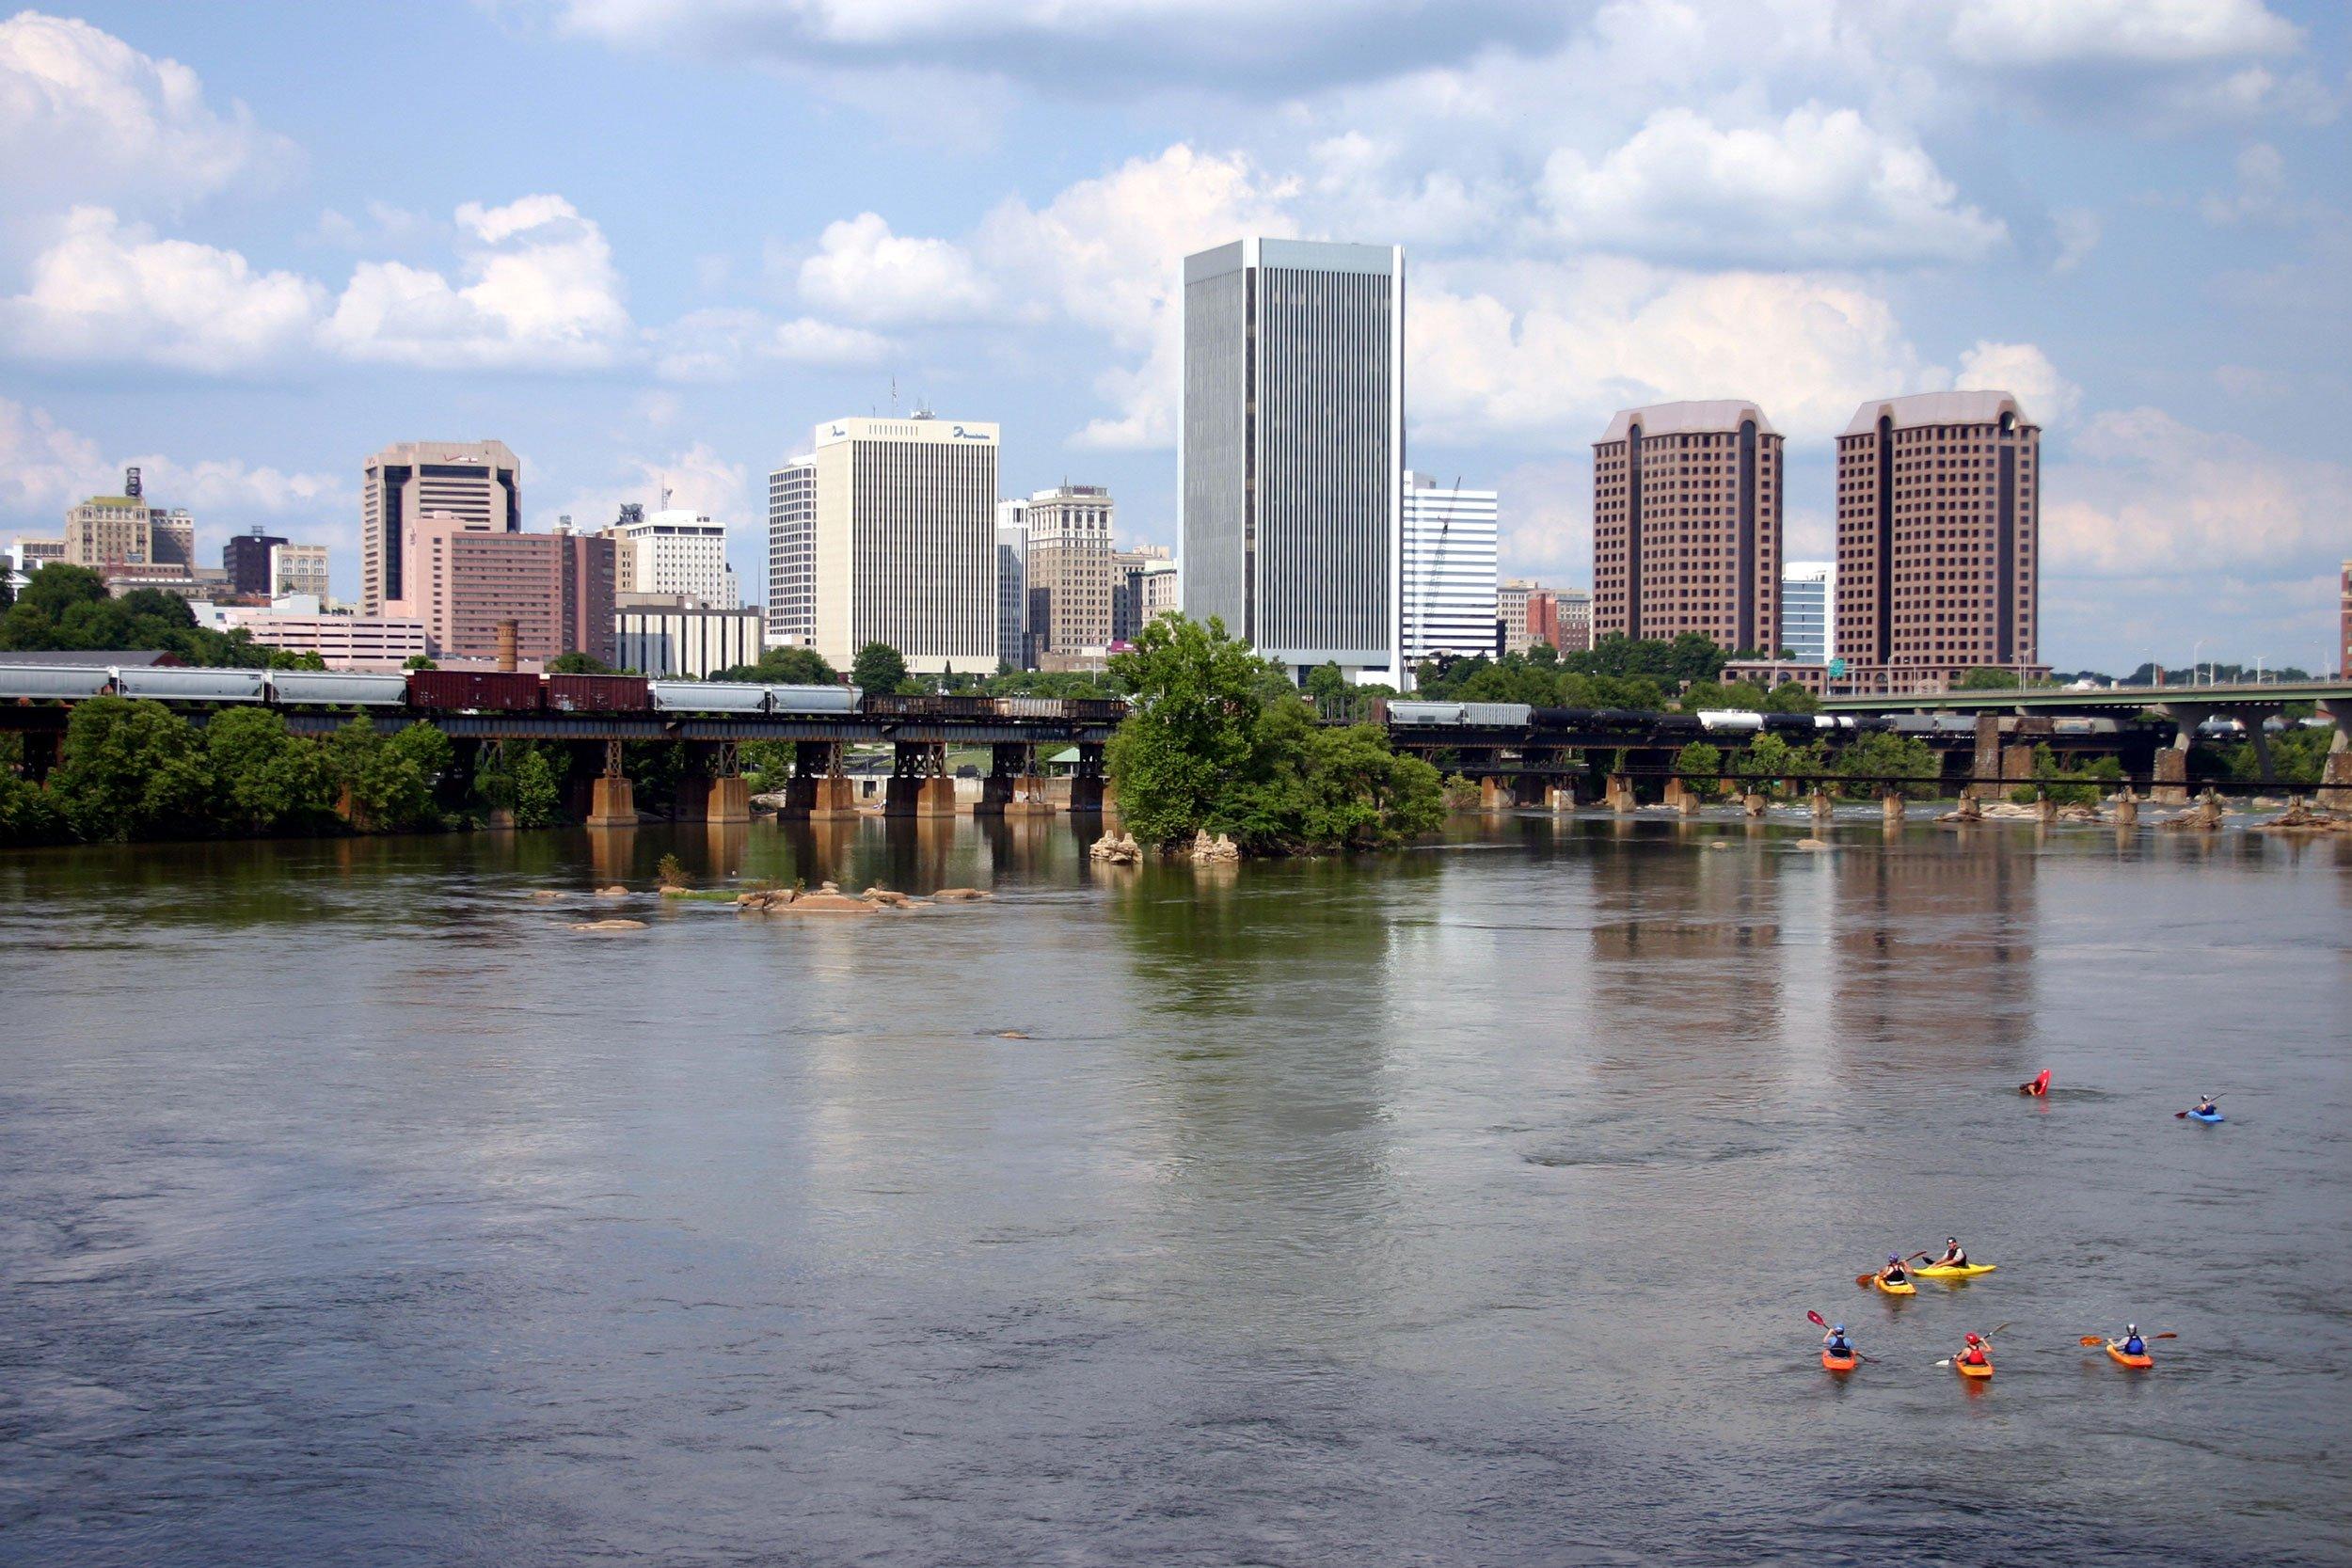 Kayaking the James River in Richmond Virginia | 2 Week Virginia Road Trip from Washington DC